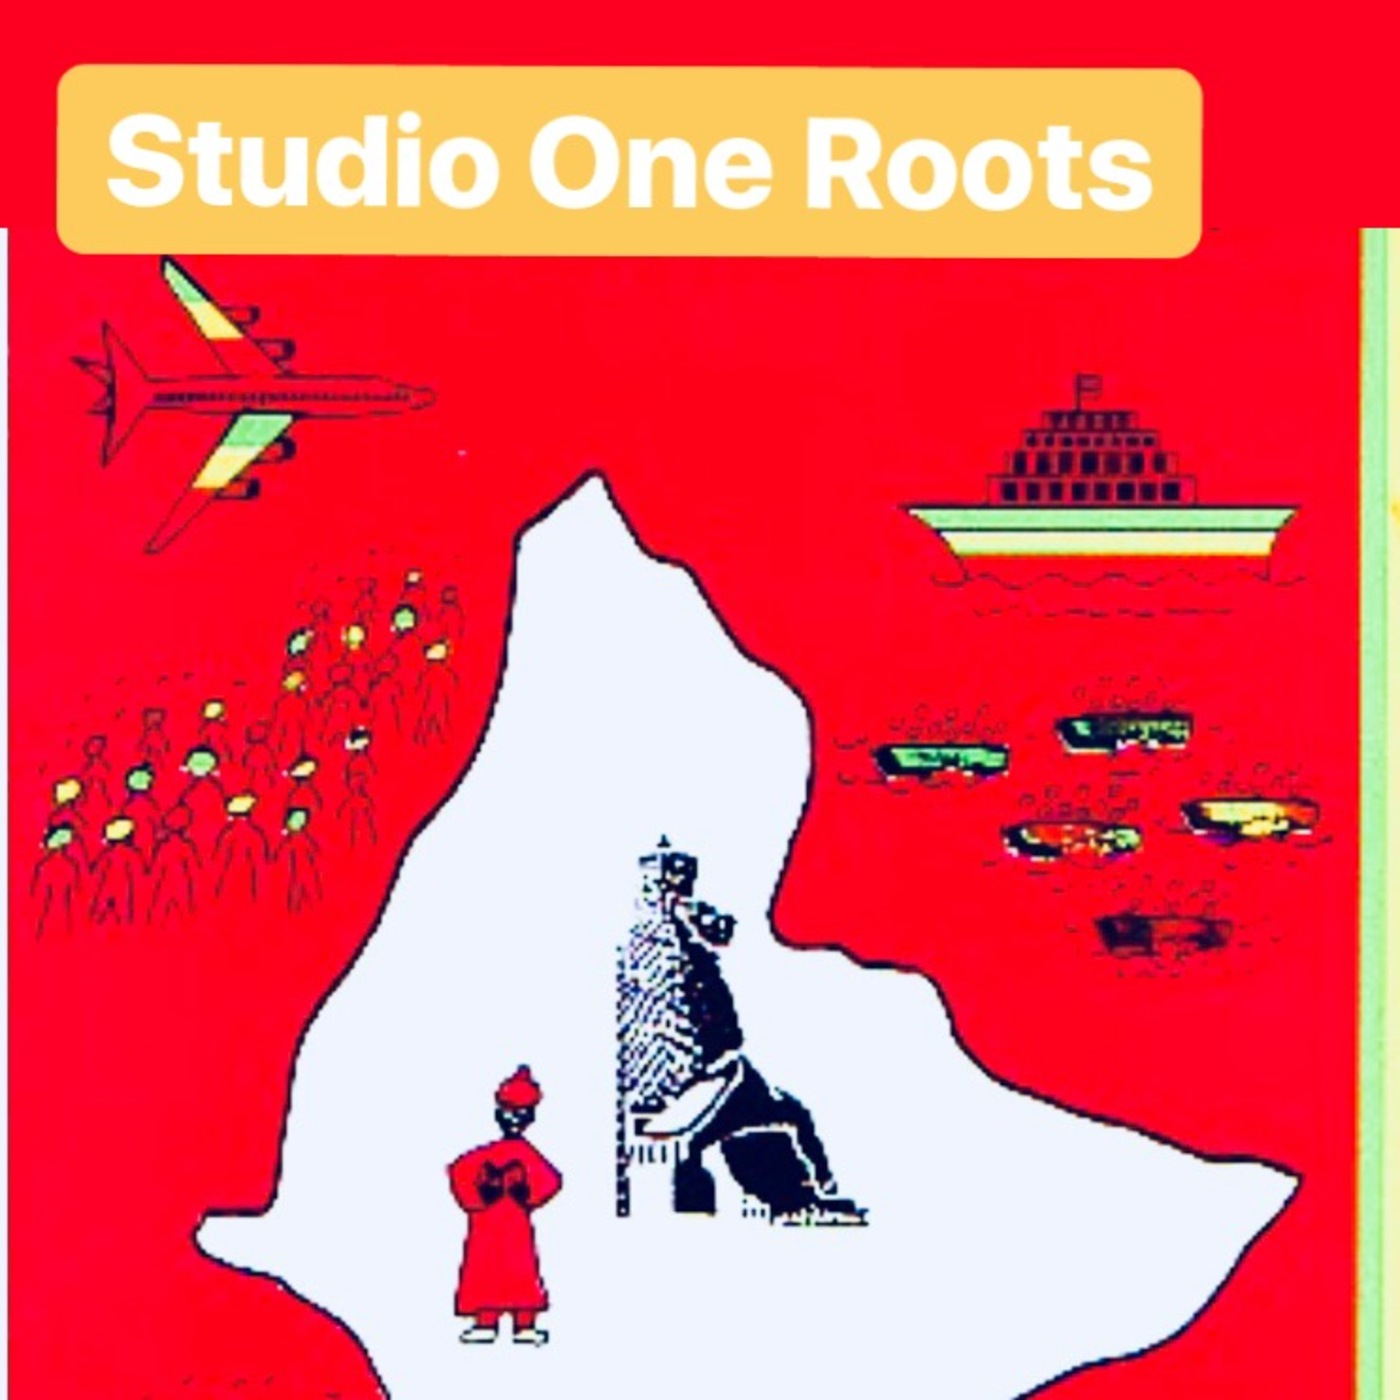 rocksteady to reggae to roots to rubAdub